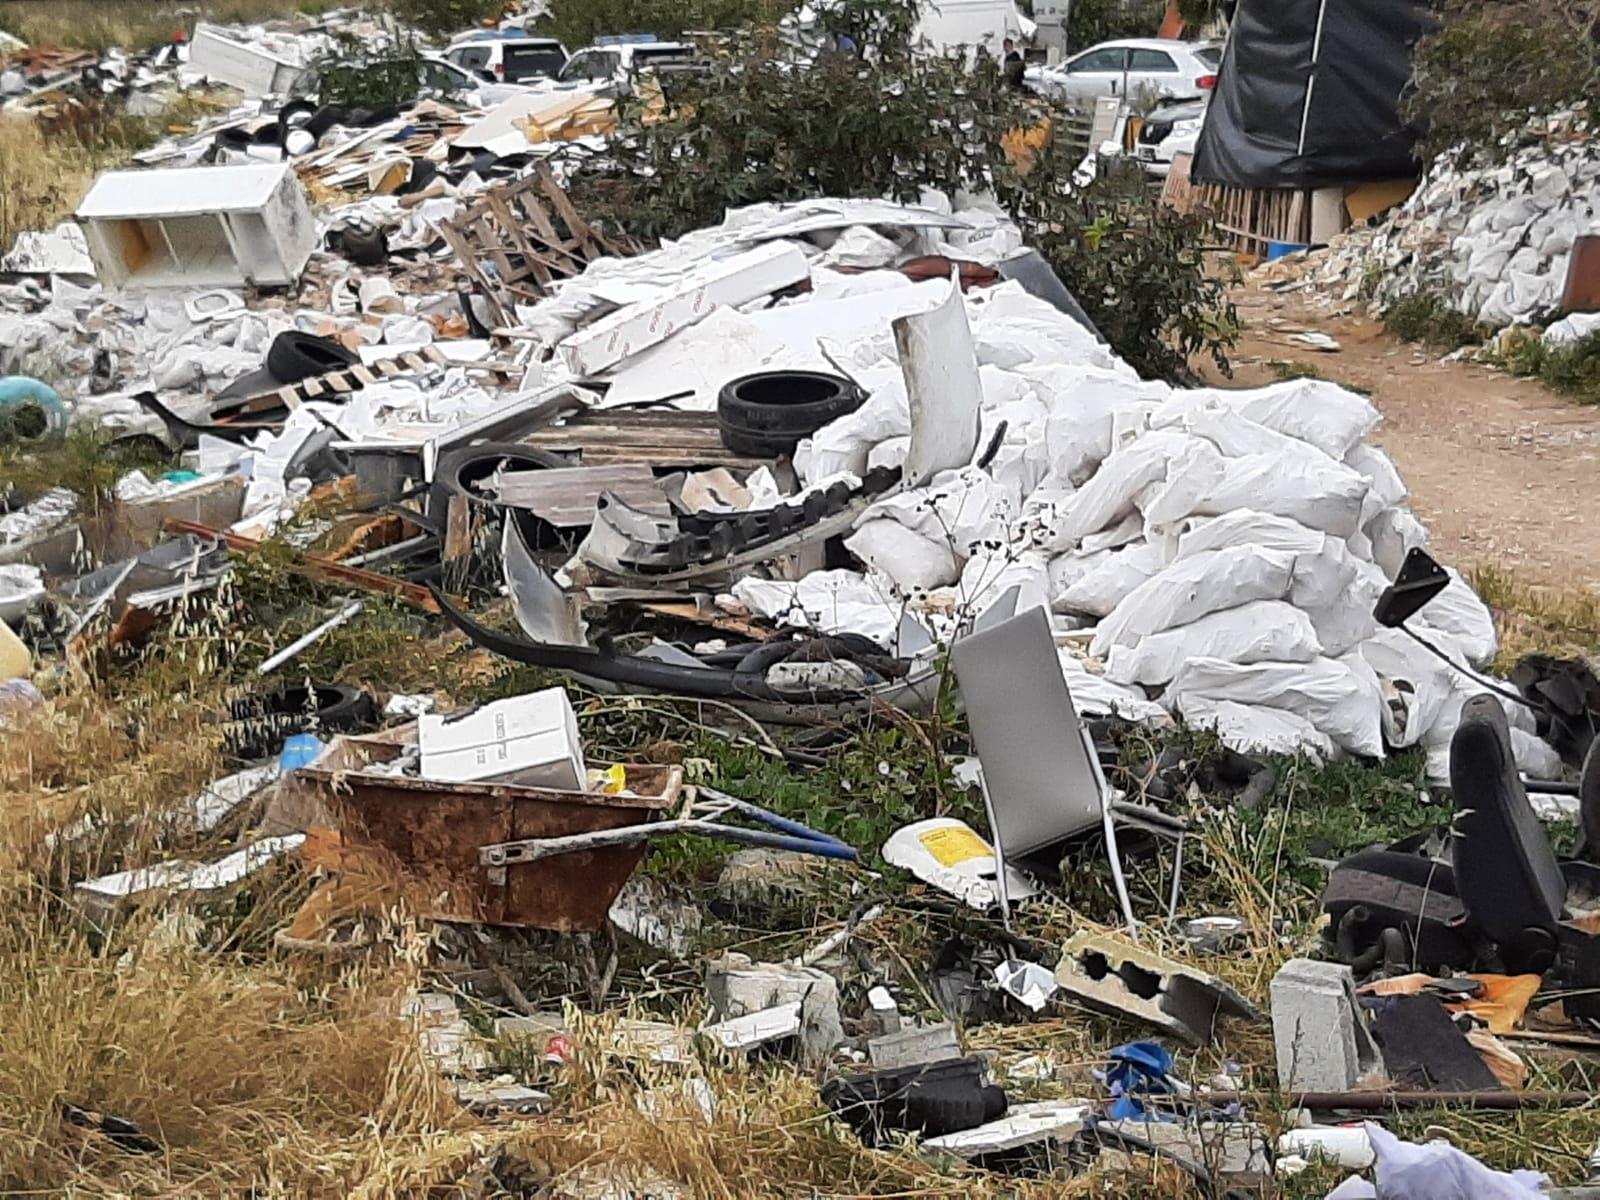 La Guardia Civil investiga un gran vertedero ilegal junto al Estadi Balear